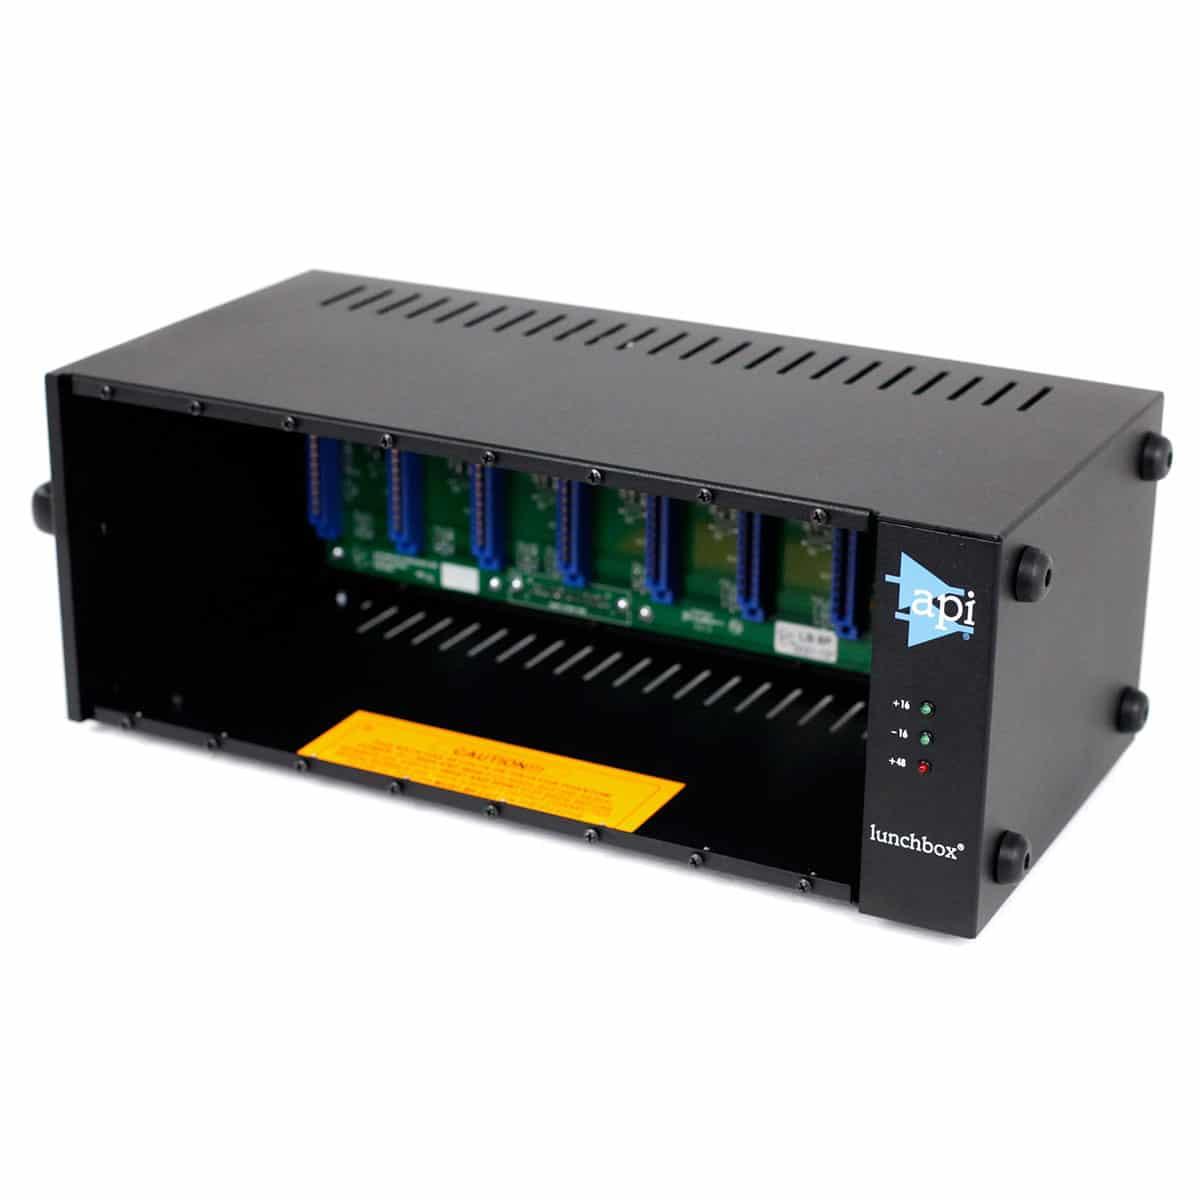 API 500 8B Accessories, Lunchbox, Pro Audio api 500 8b angle